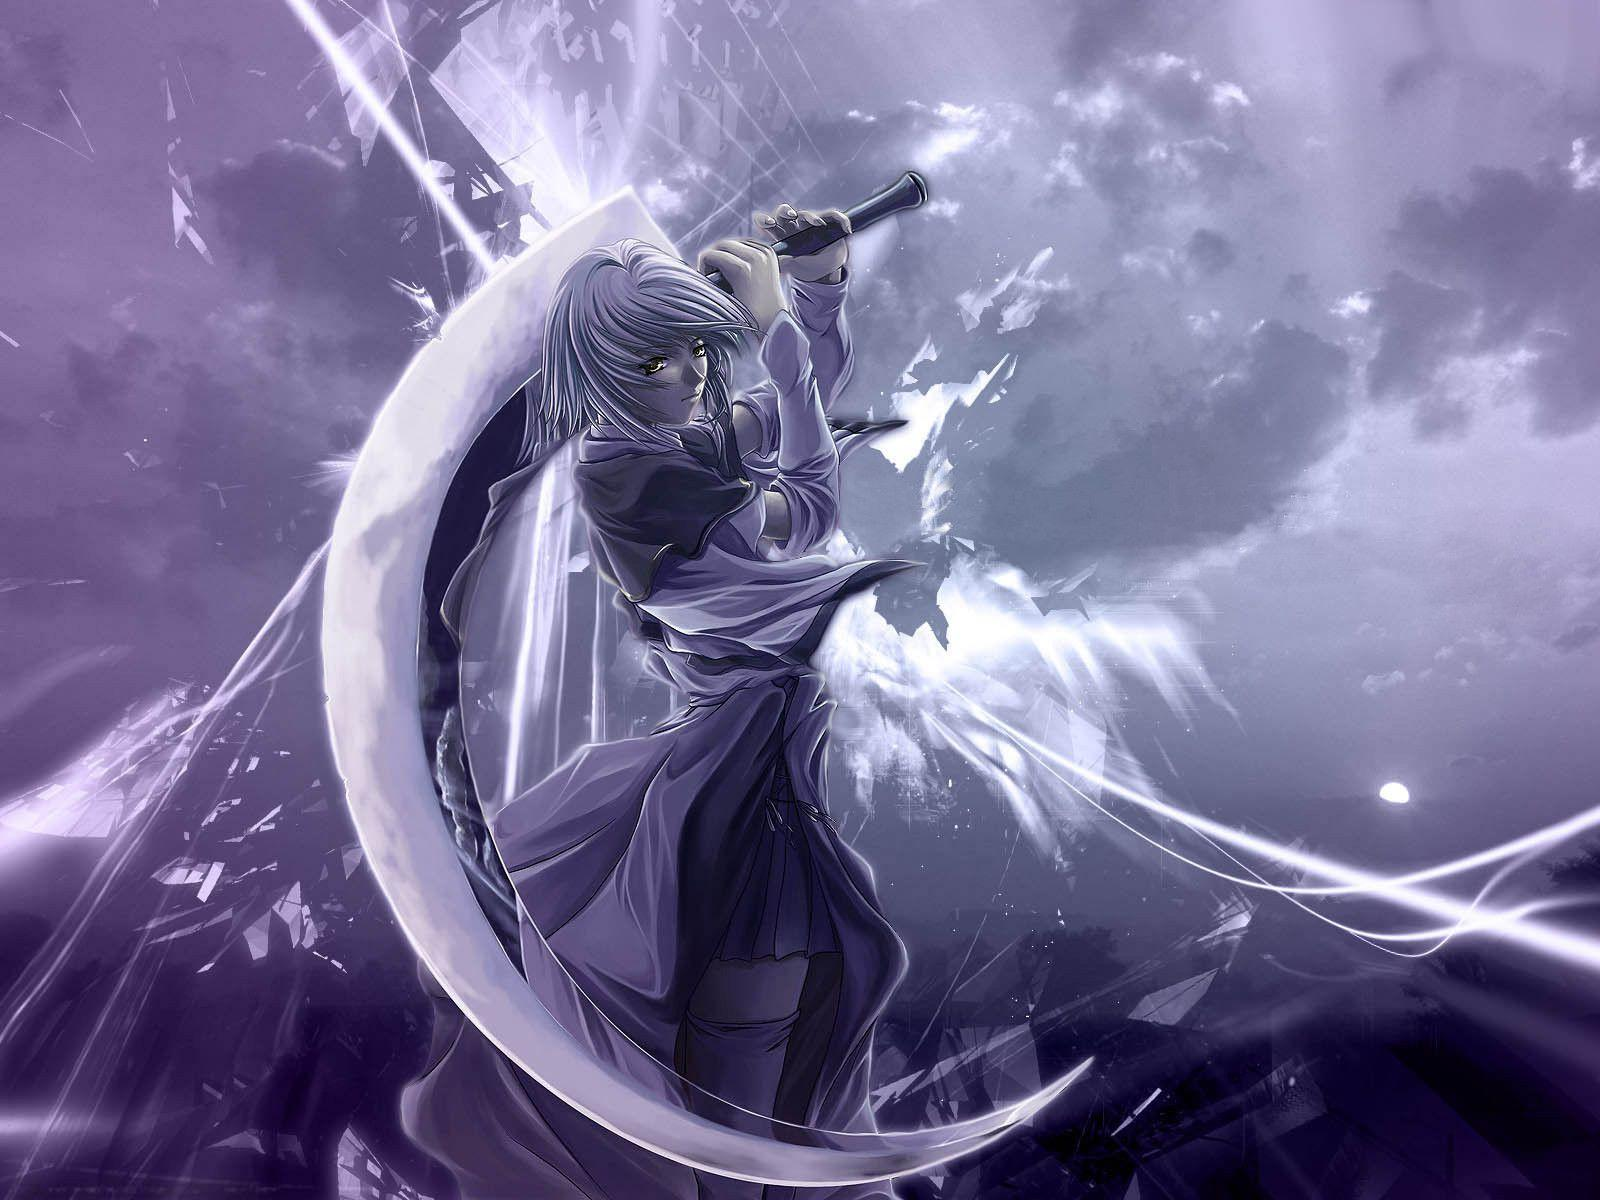 Cool Anime Wallpapers HD 1600x1200